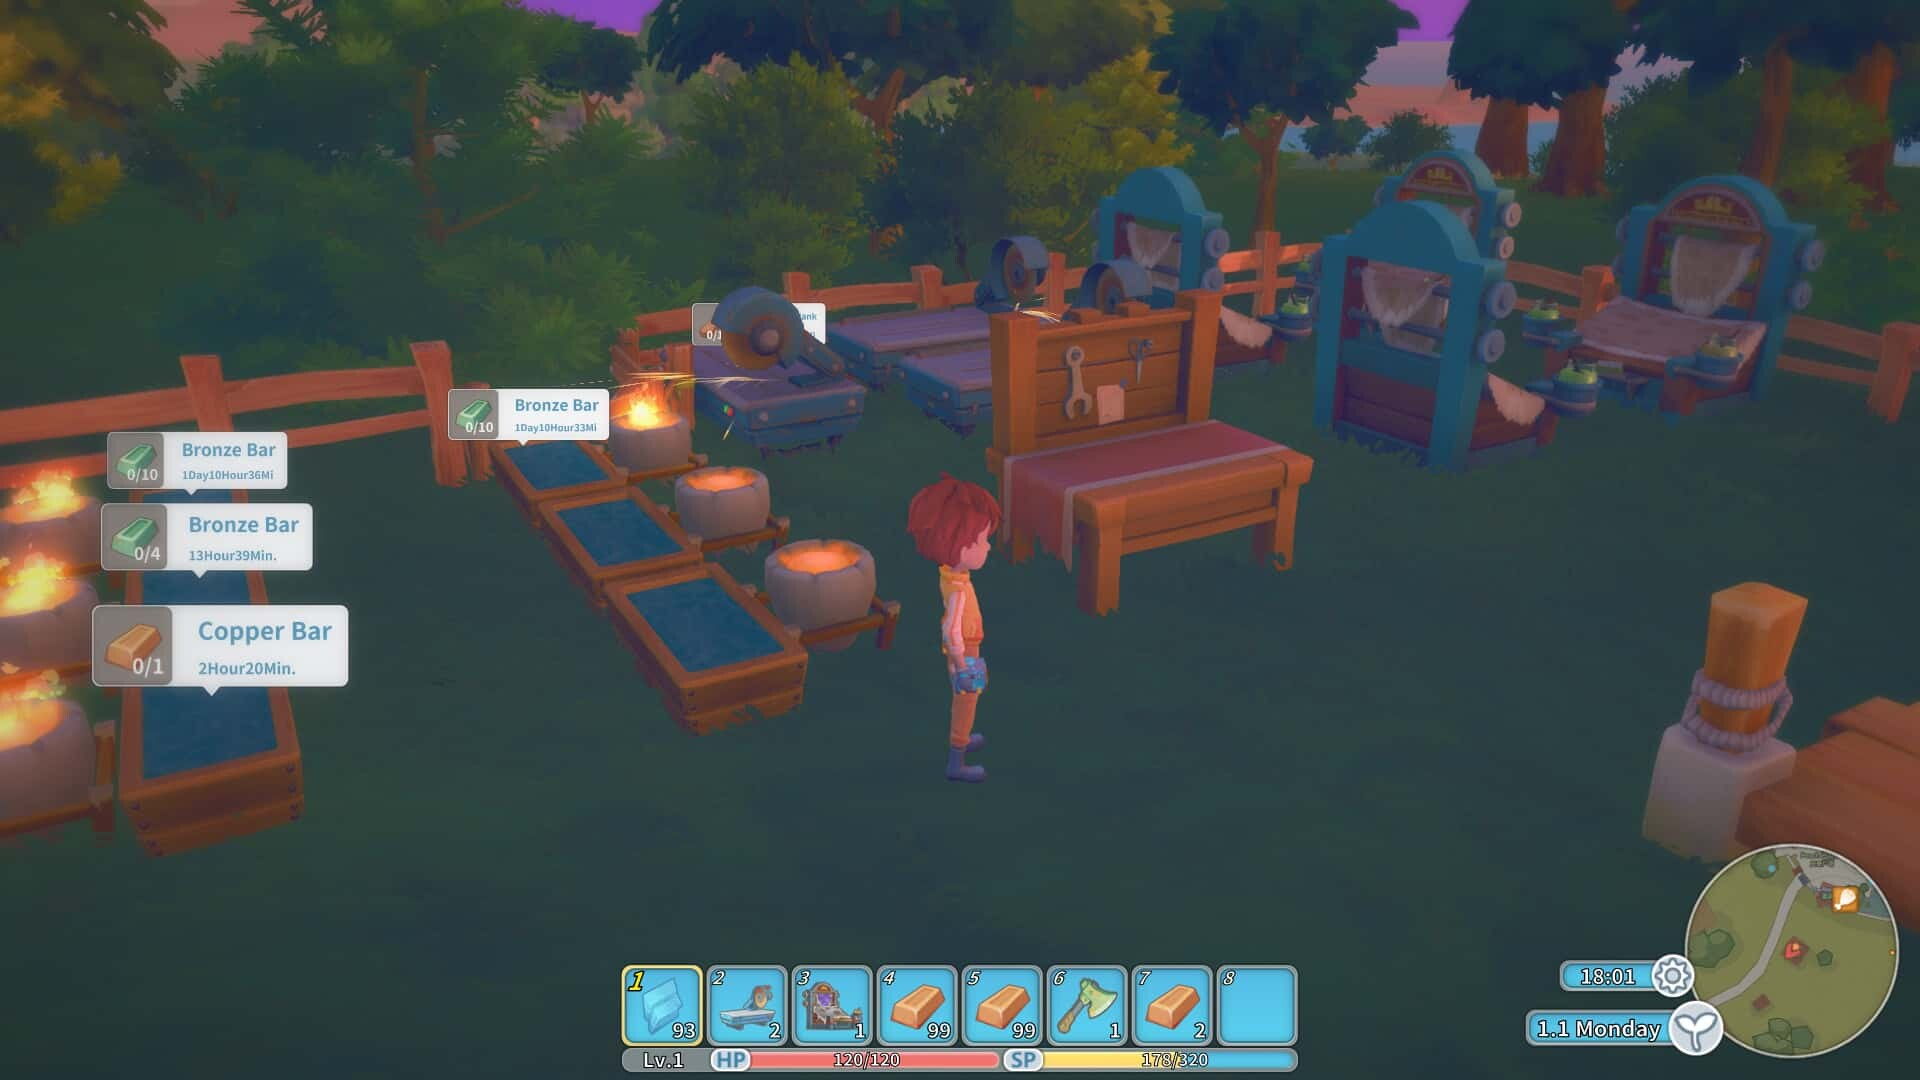 My Time at Portia game screenshot courtesy Steam